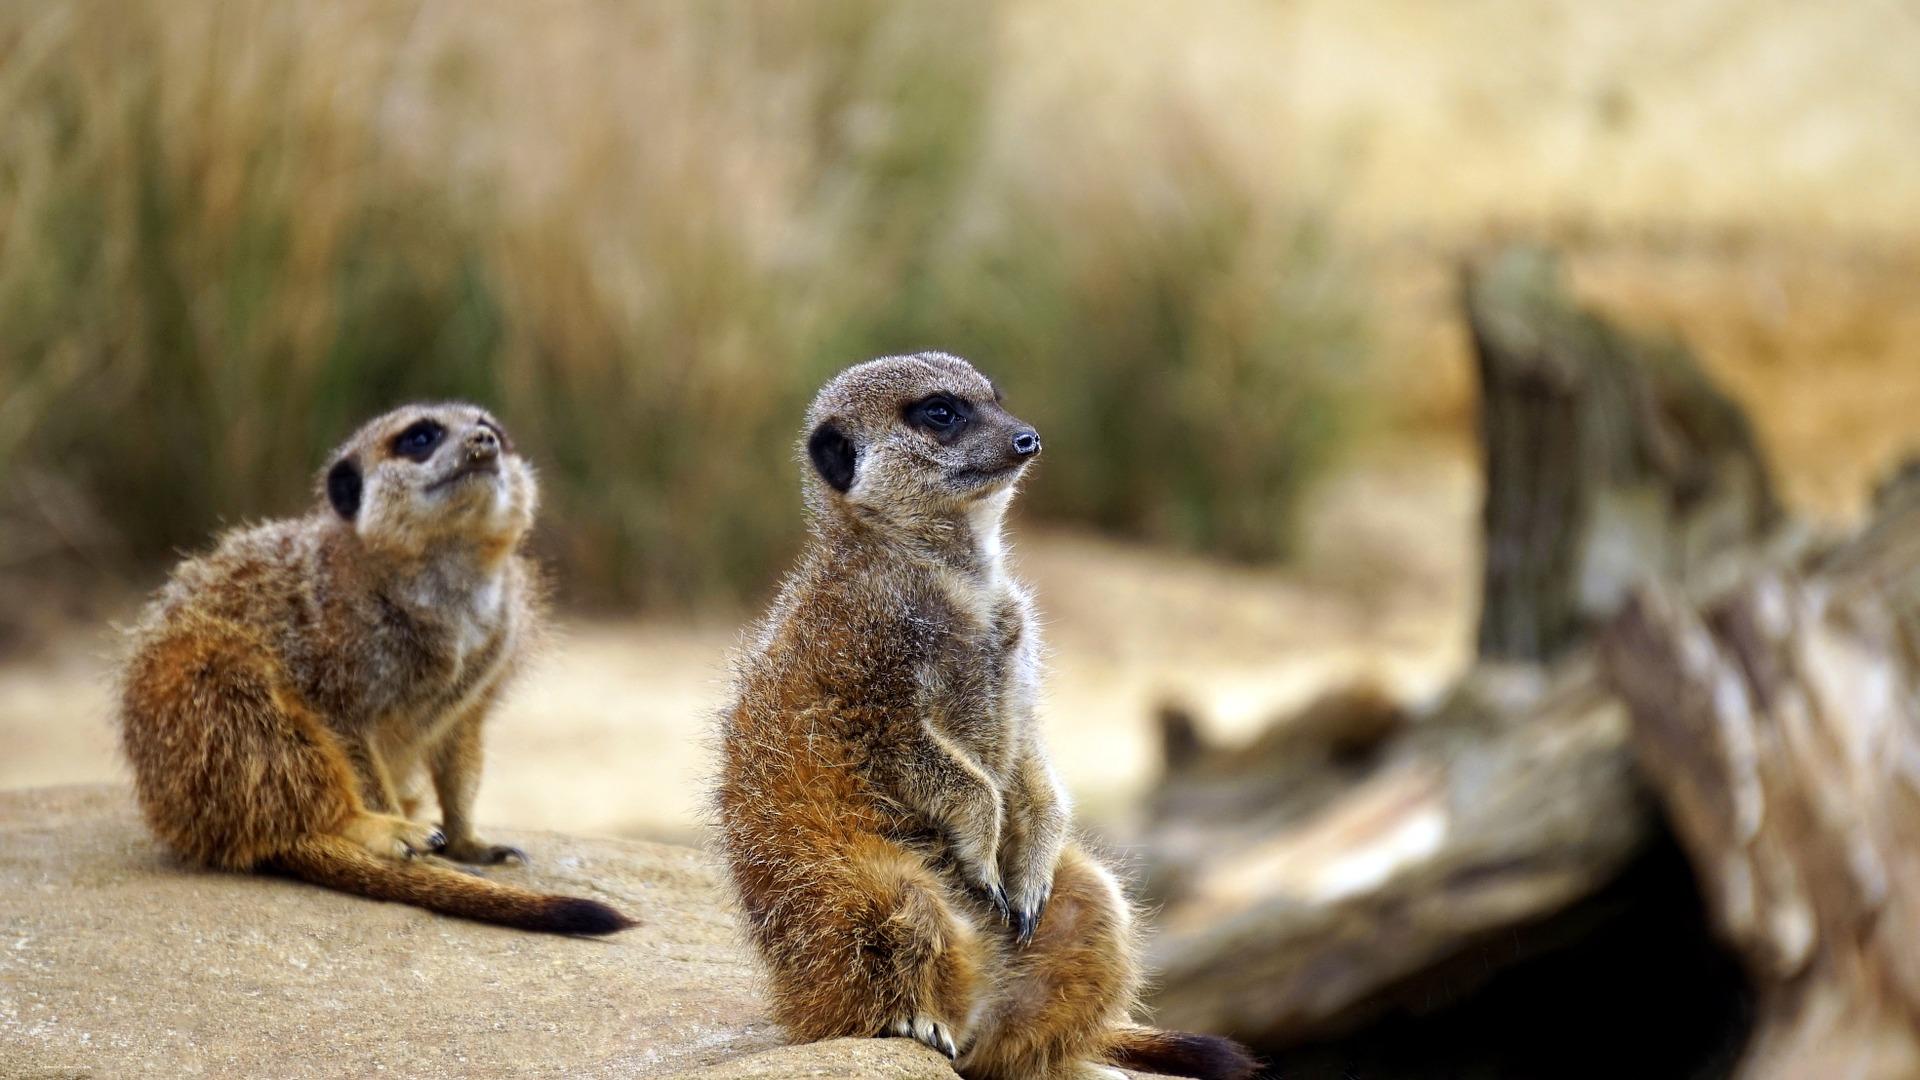 Meerkat, वन्य जीवन, स्वतंत्रता, पशुवर्ग, अफ्रीका, रेगिस्तान - HD वॉलपेपर - प्रोफेसर-falken.com